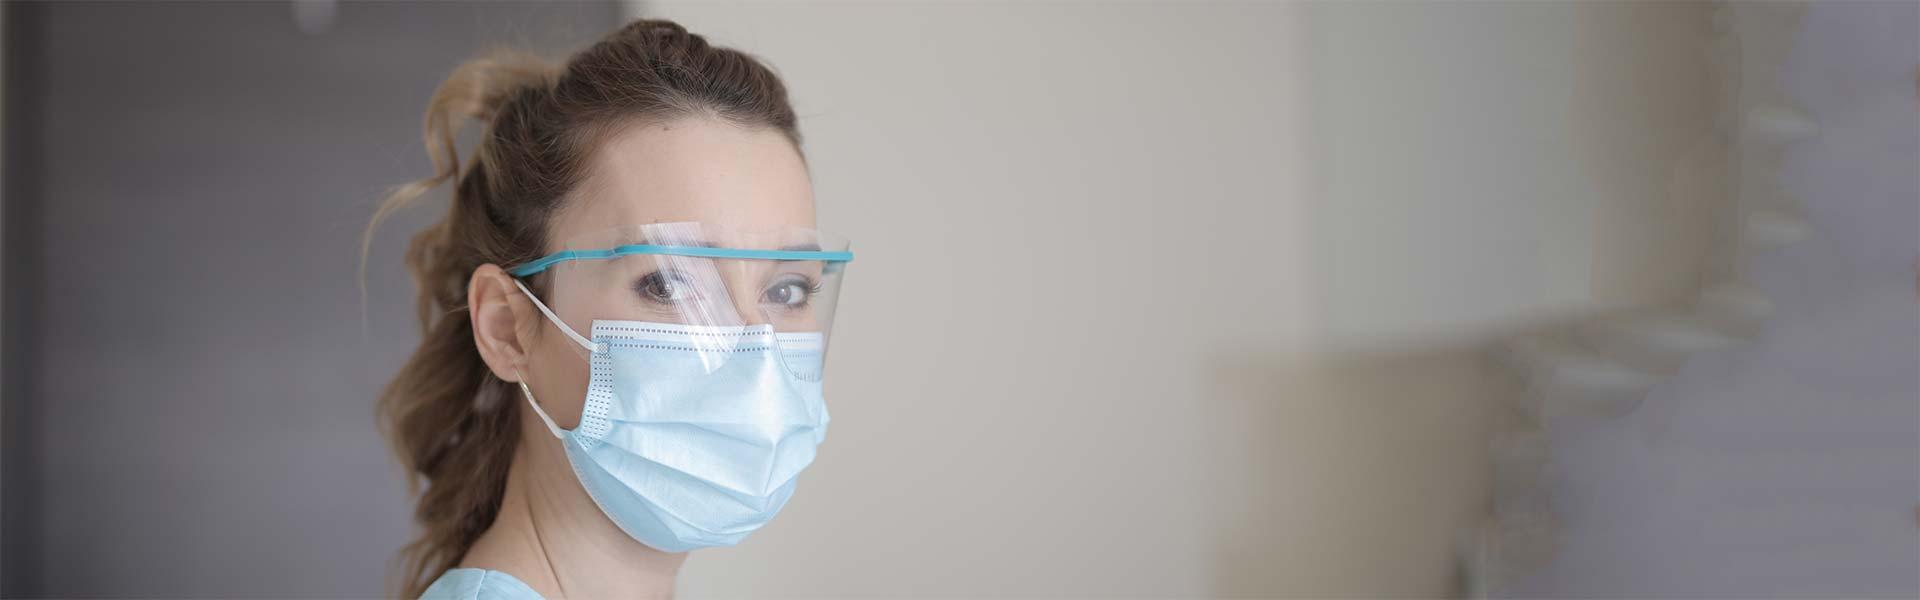 consejos Coronavirus Asistencia Médica Inmediata